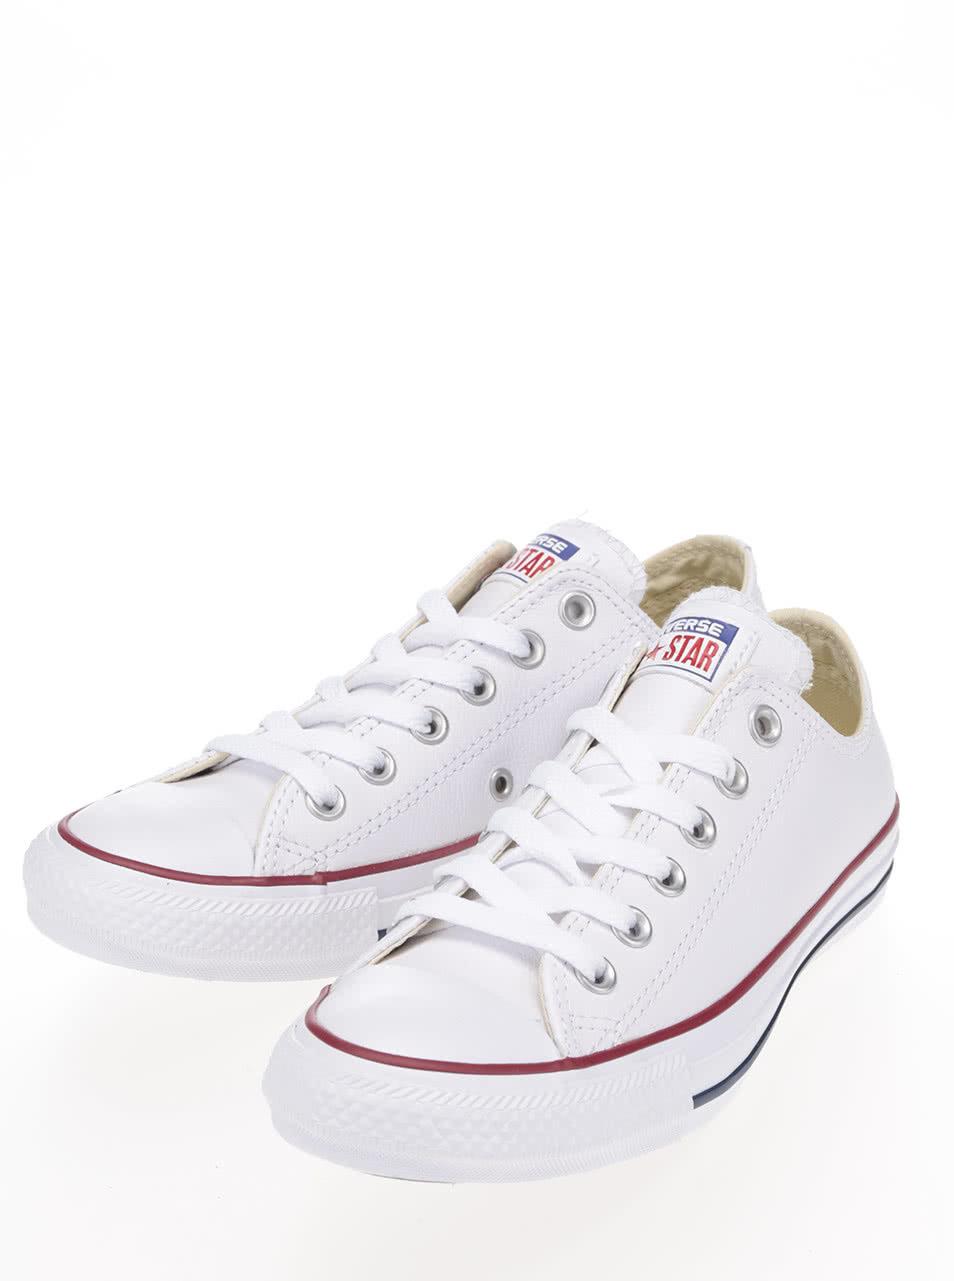 ed9c29bd18 Biele unisex kožené tenisky Converse Chuck Taylor All Star ...